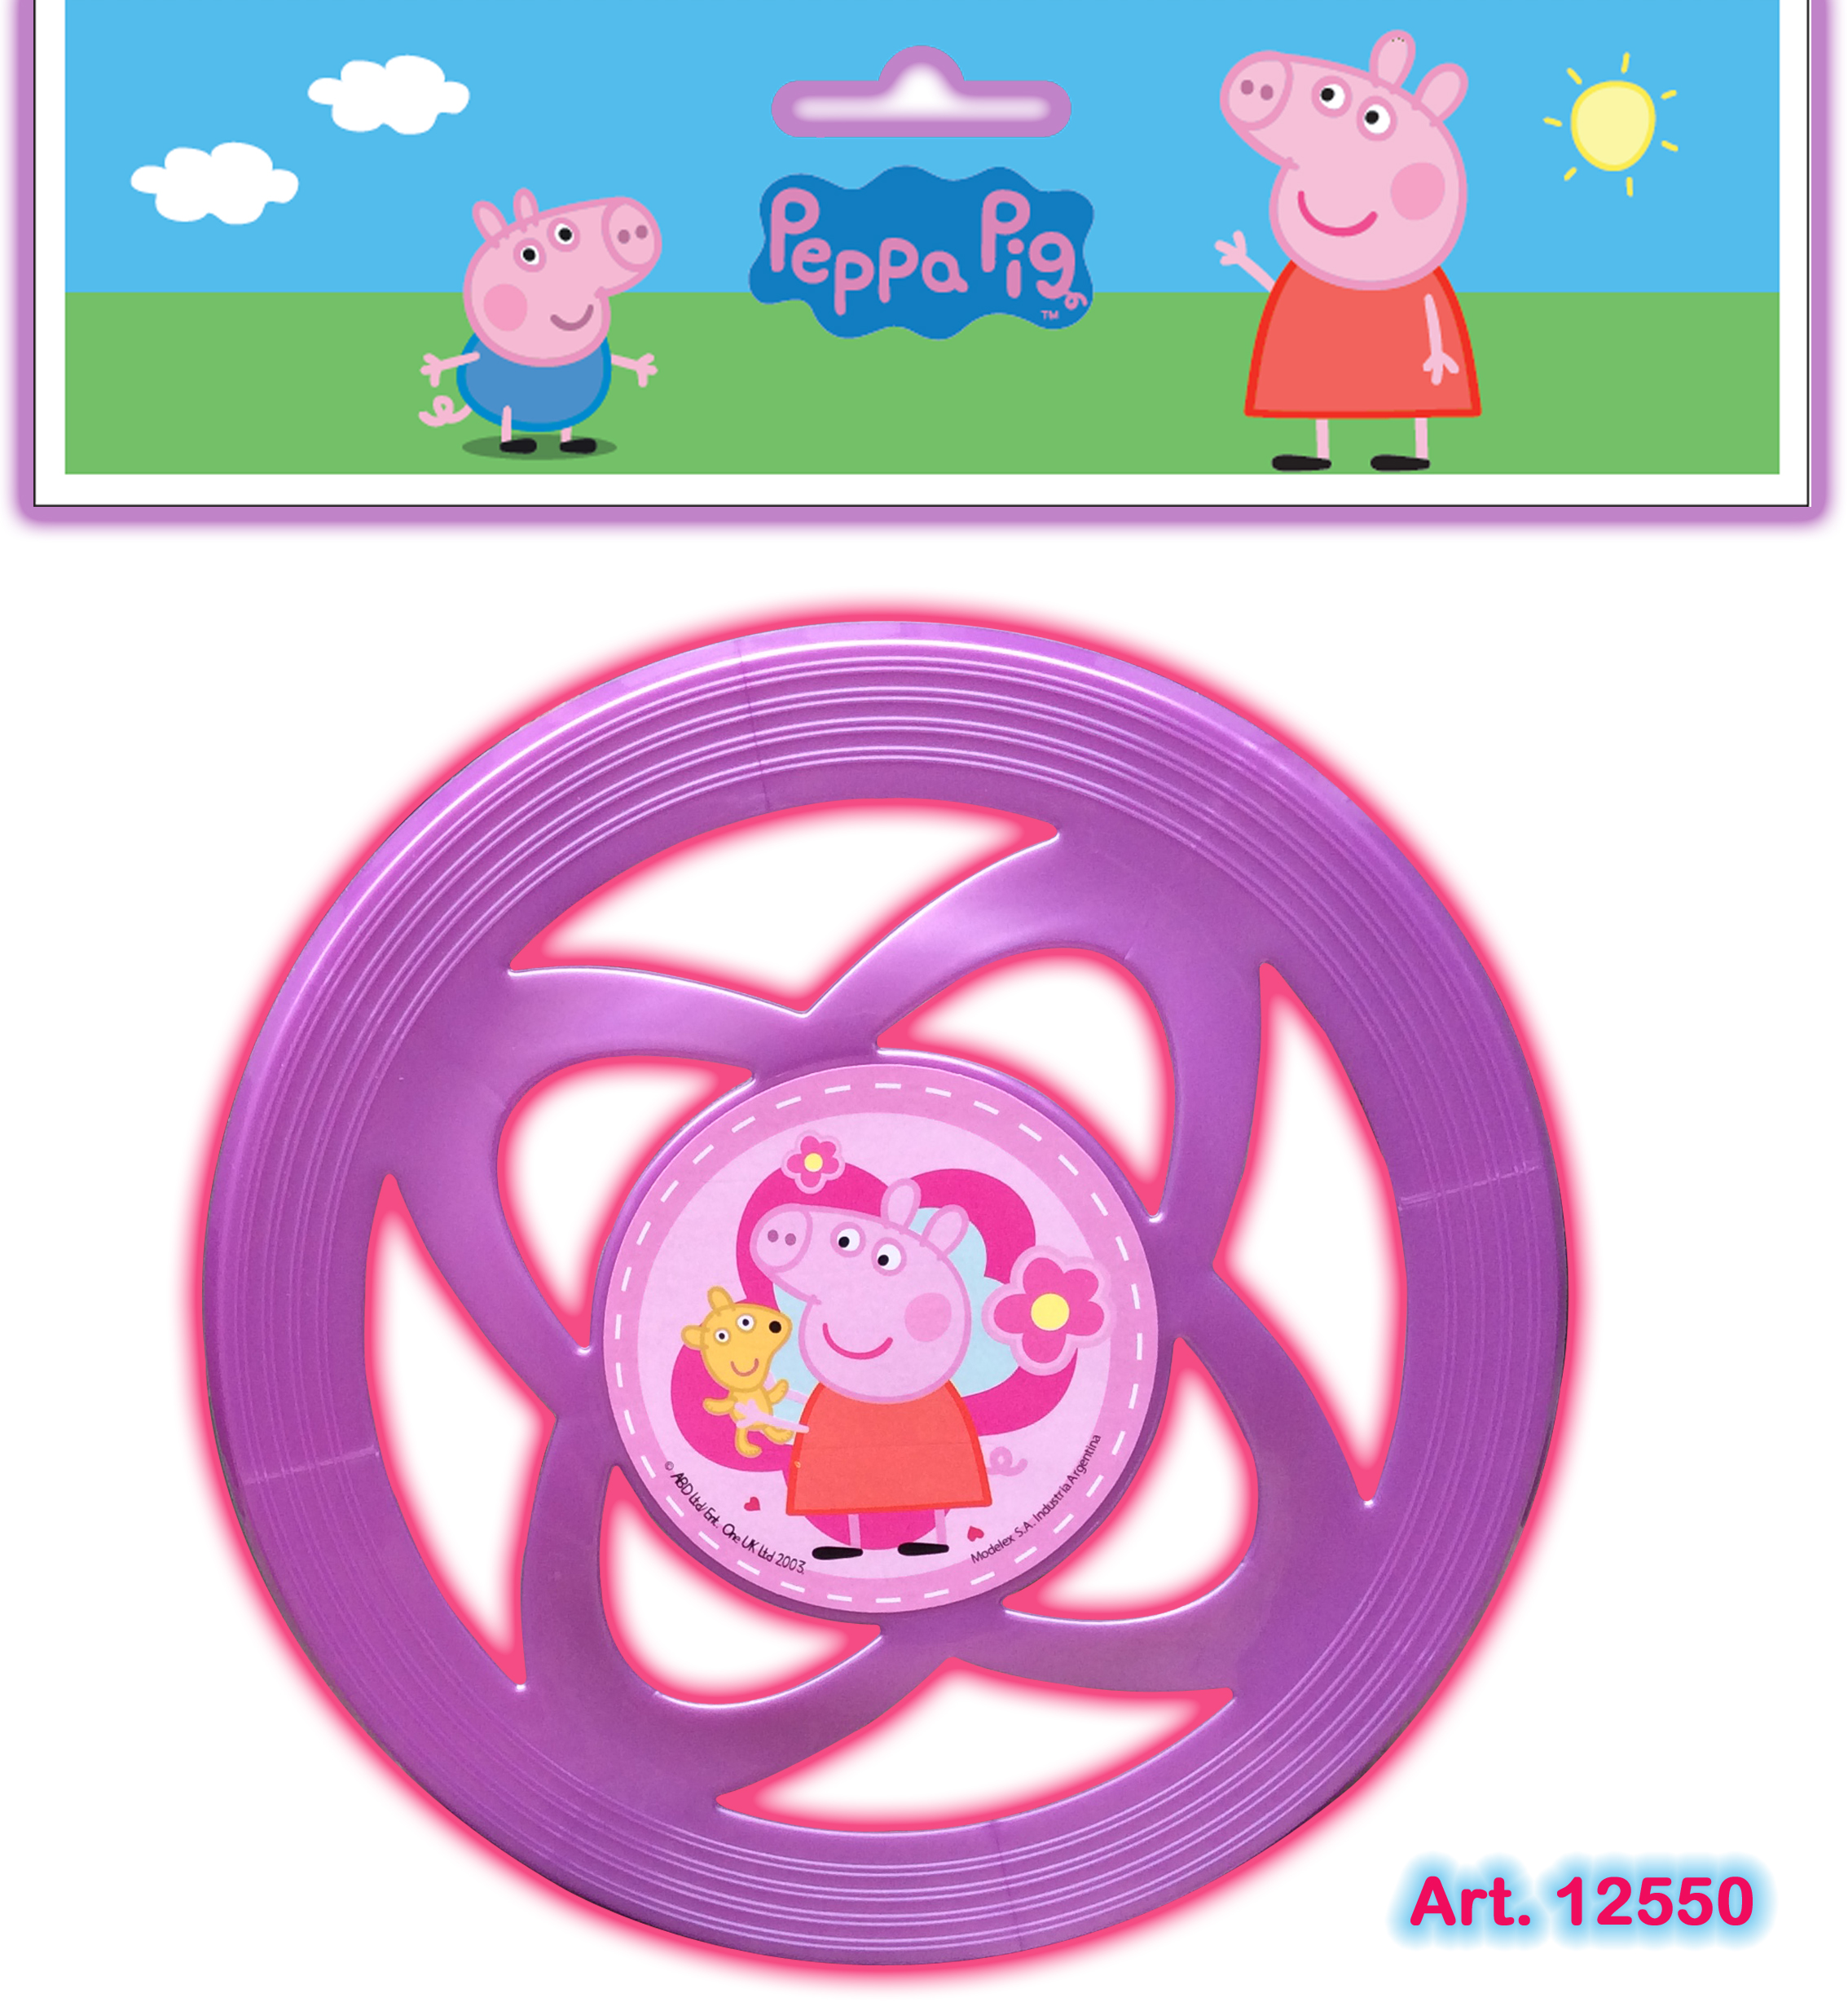 FLYER - PEPPA PIG